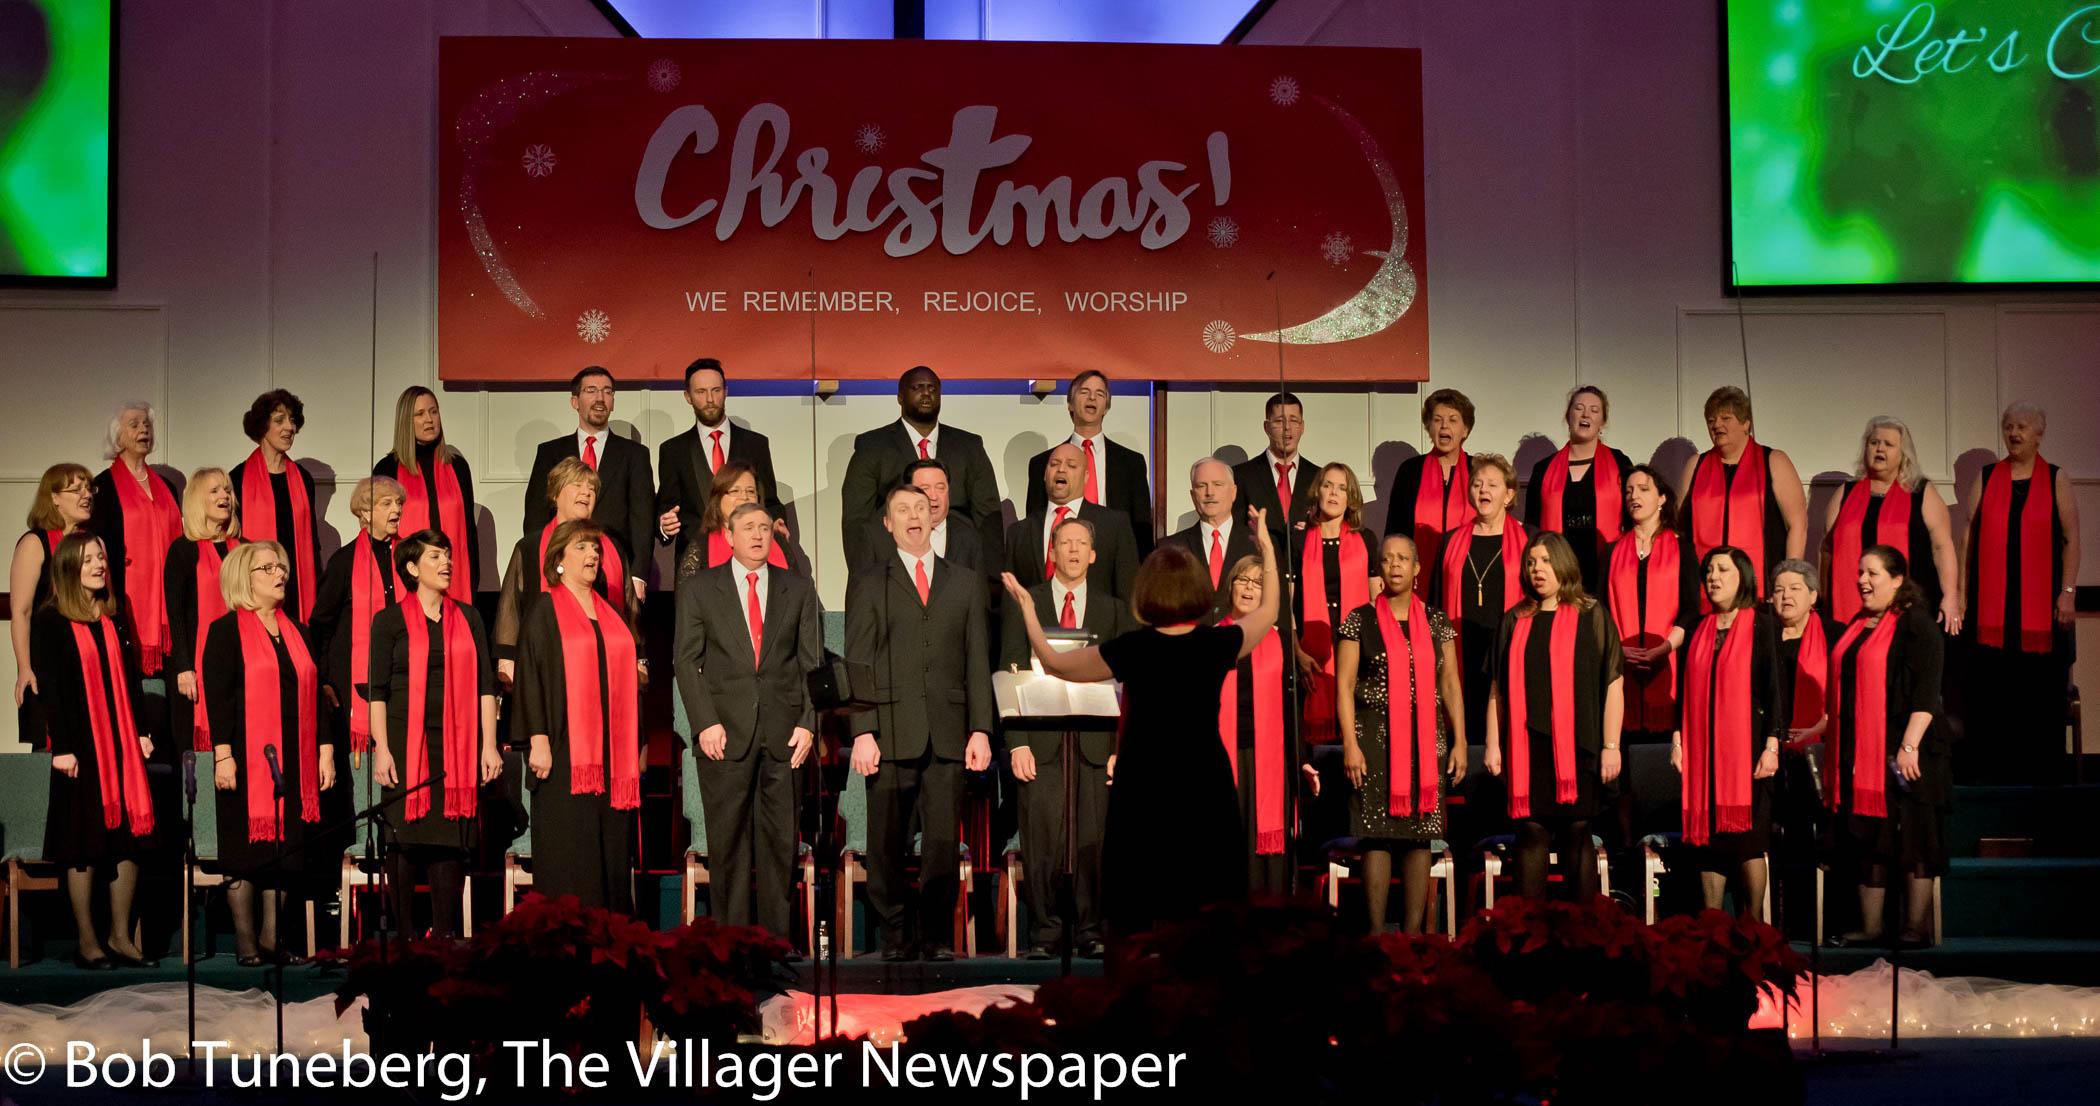 Director Robin Nichols leads the Christian Heritage Church Choir in this year's Christmas Canta-ta